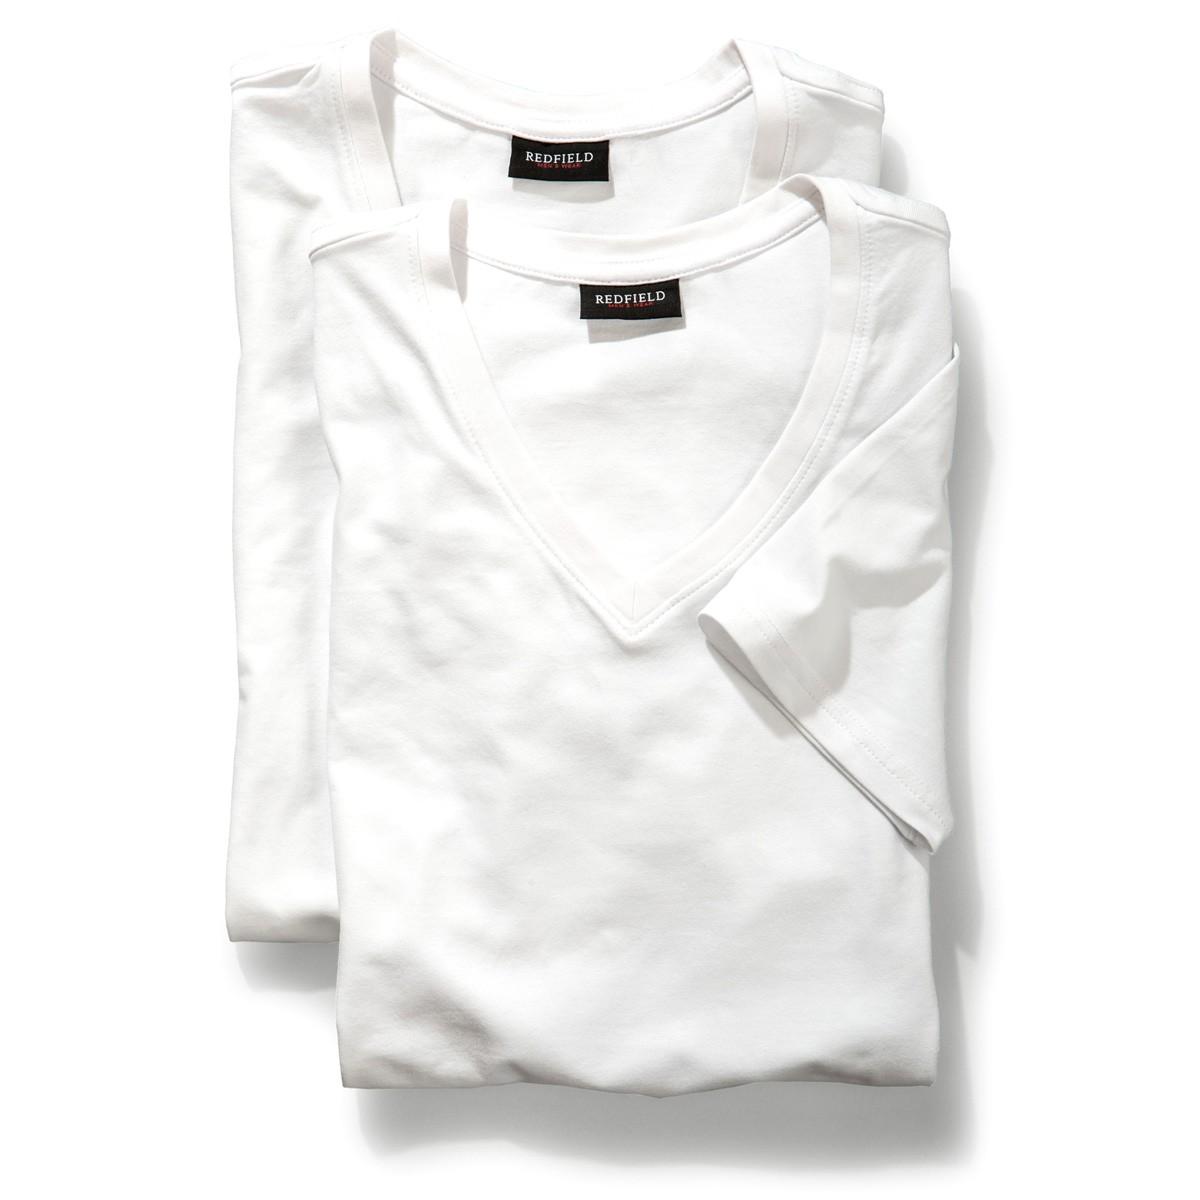 wei es doppelpack t shirt v ausschnitt redfield bergr e. Black Bedroom Furniture Sets. Home Design Ideas